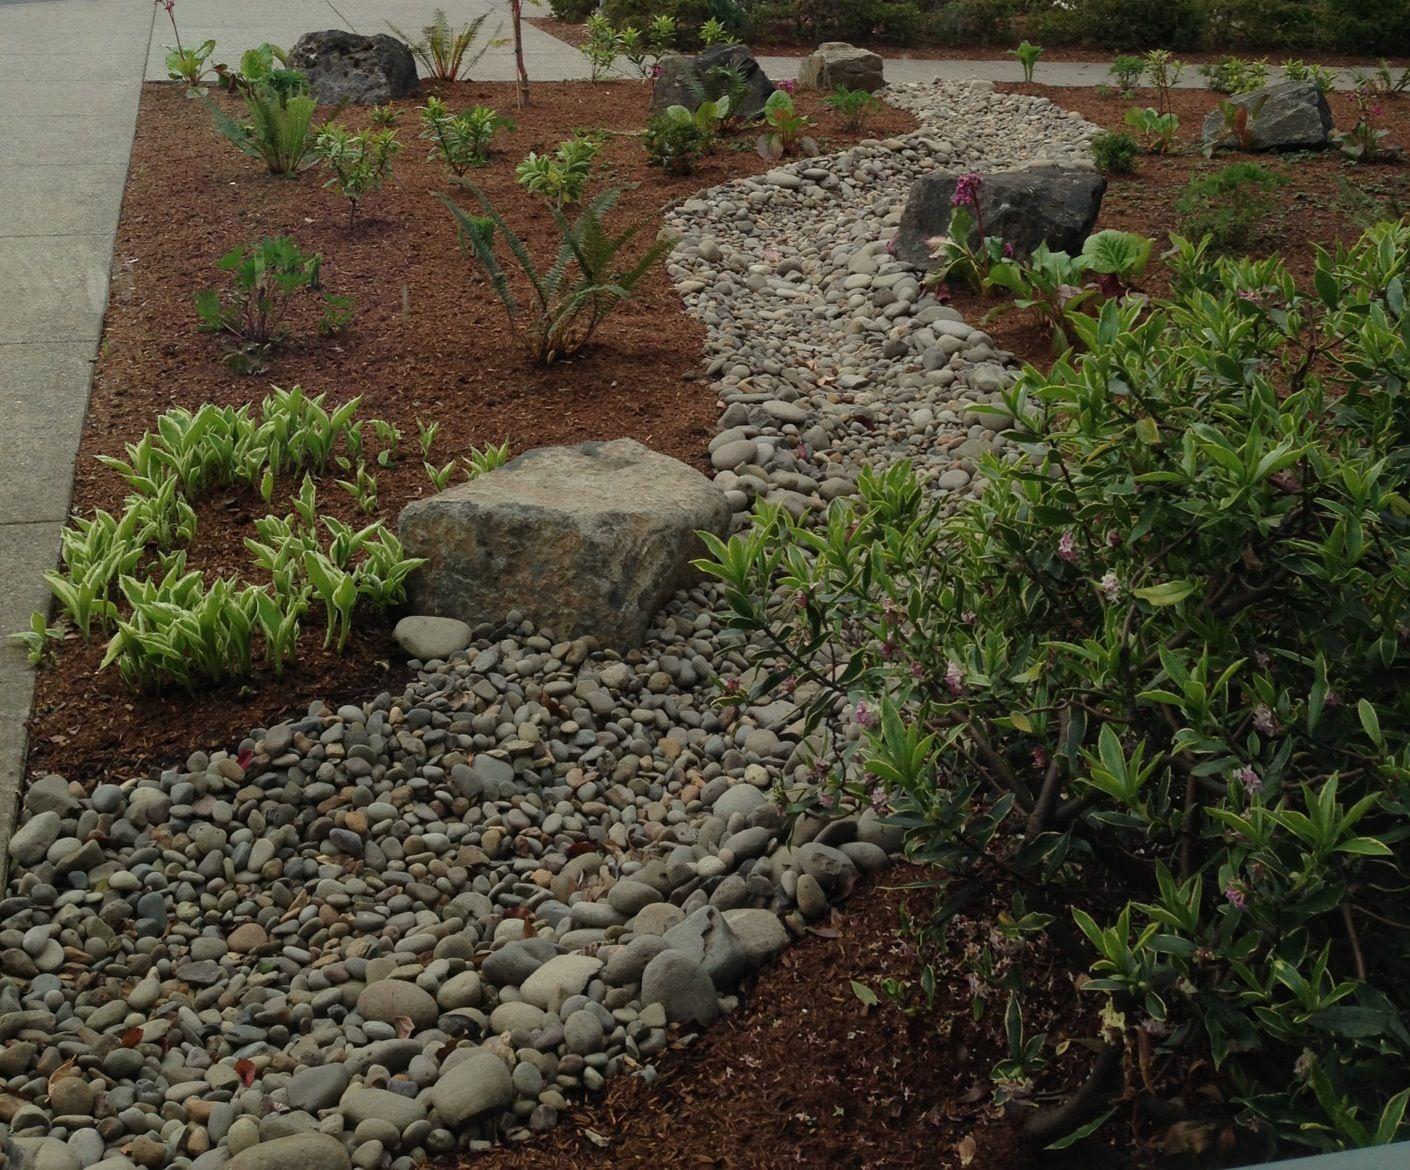 Award-Winning Front Yards | Residential Landscape - Bret Mar ...